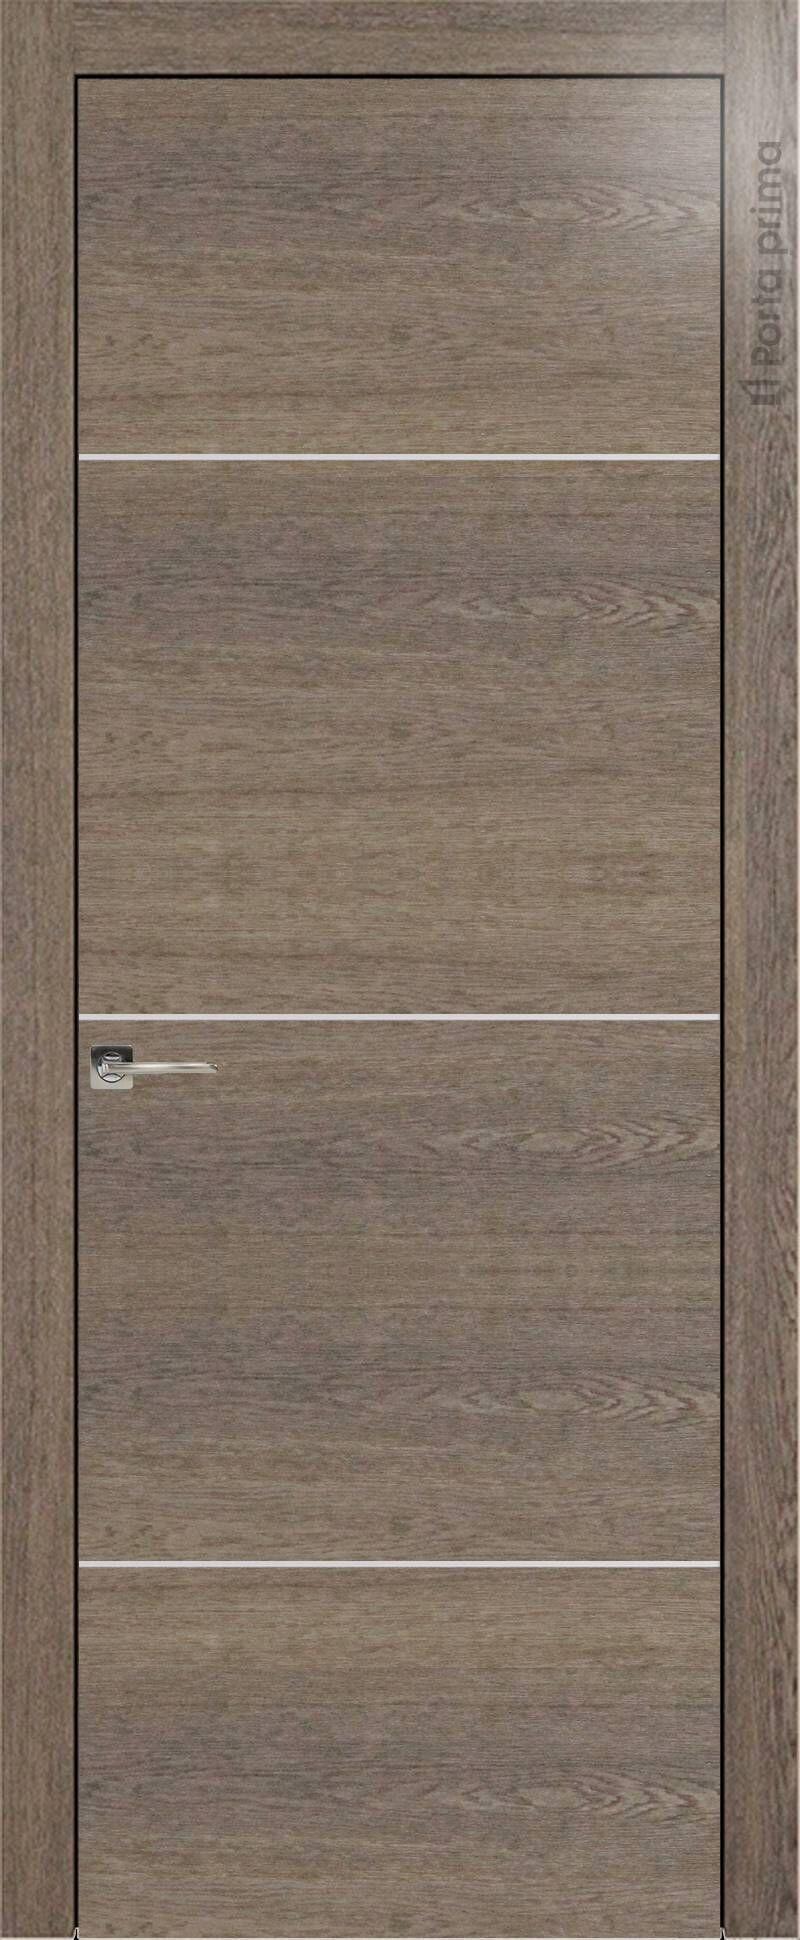 Tivoli Г-3 цвет - Дуб антик Без стекла (ДГ)